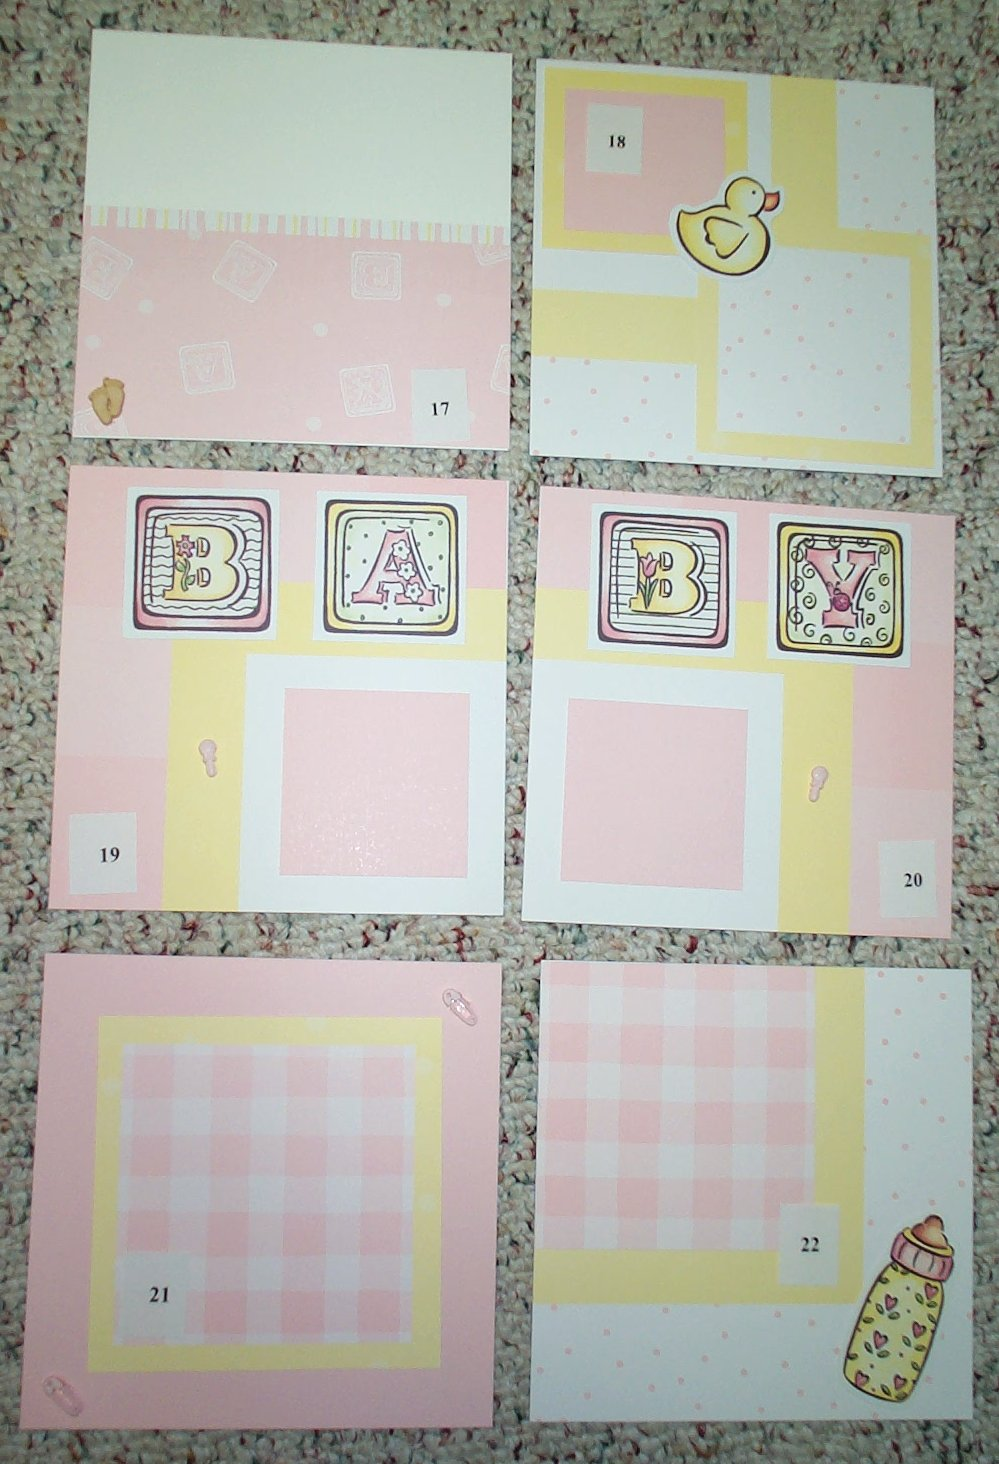 Baby girl scrapbook ideas - Baby Girl Photo 4 Layouts 17 21